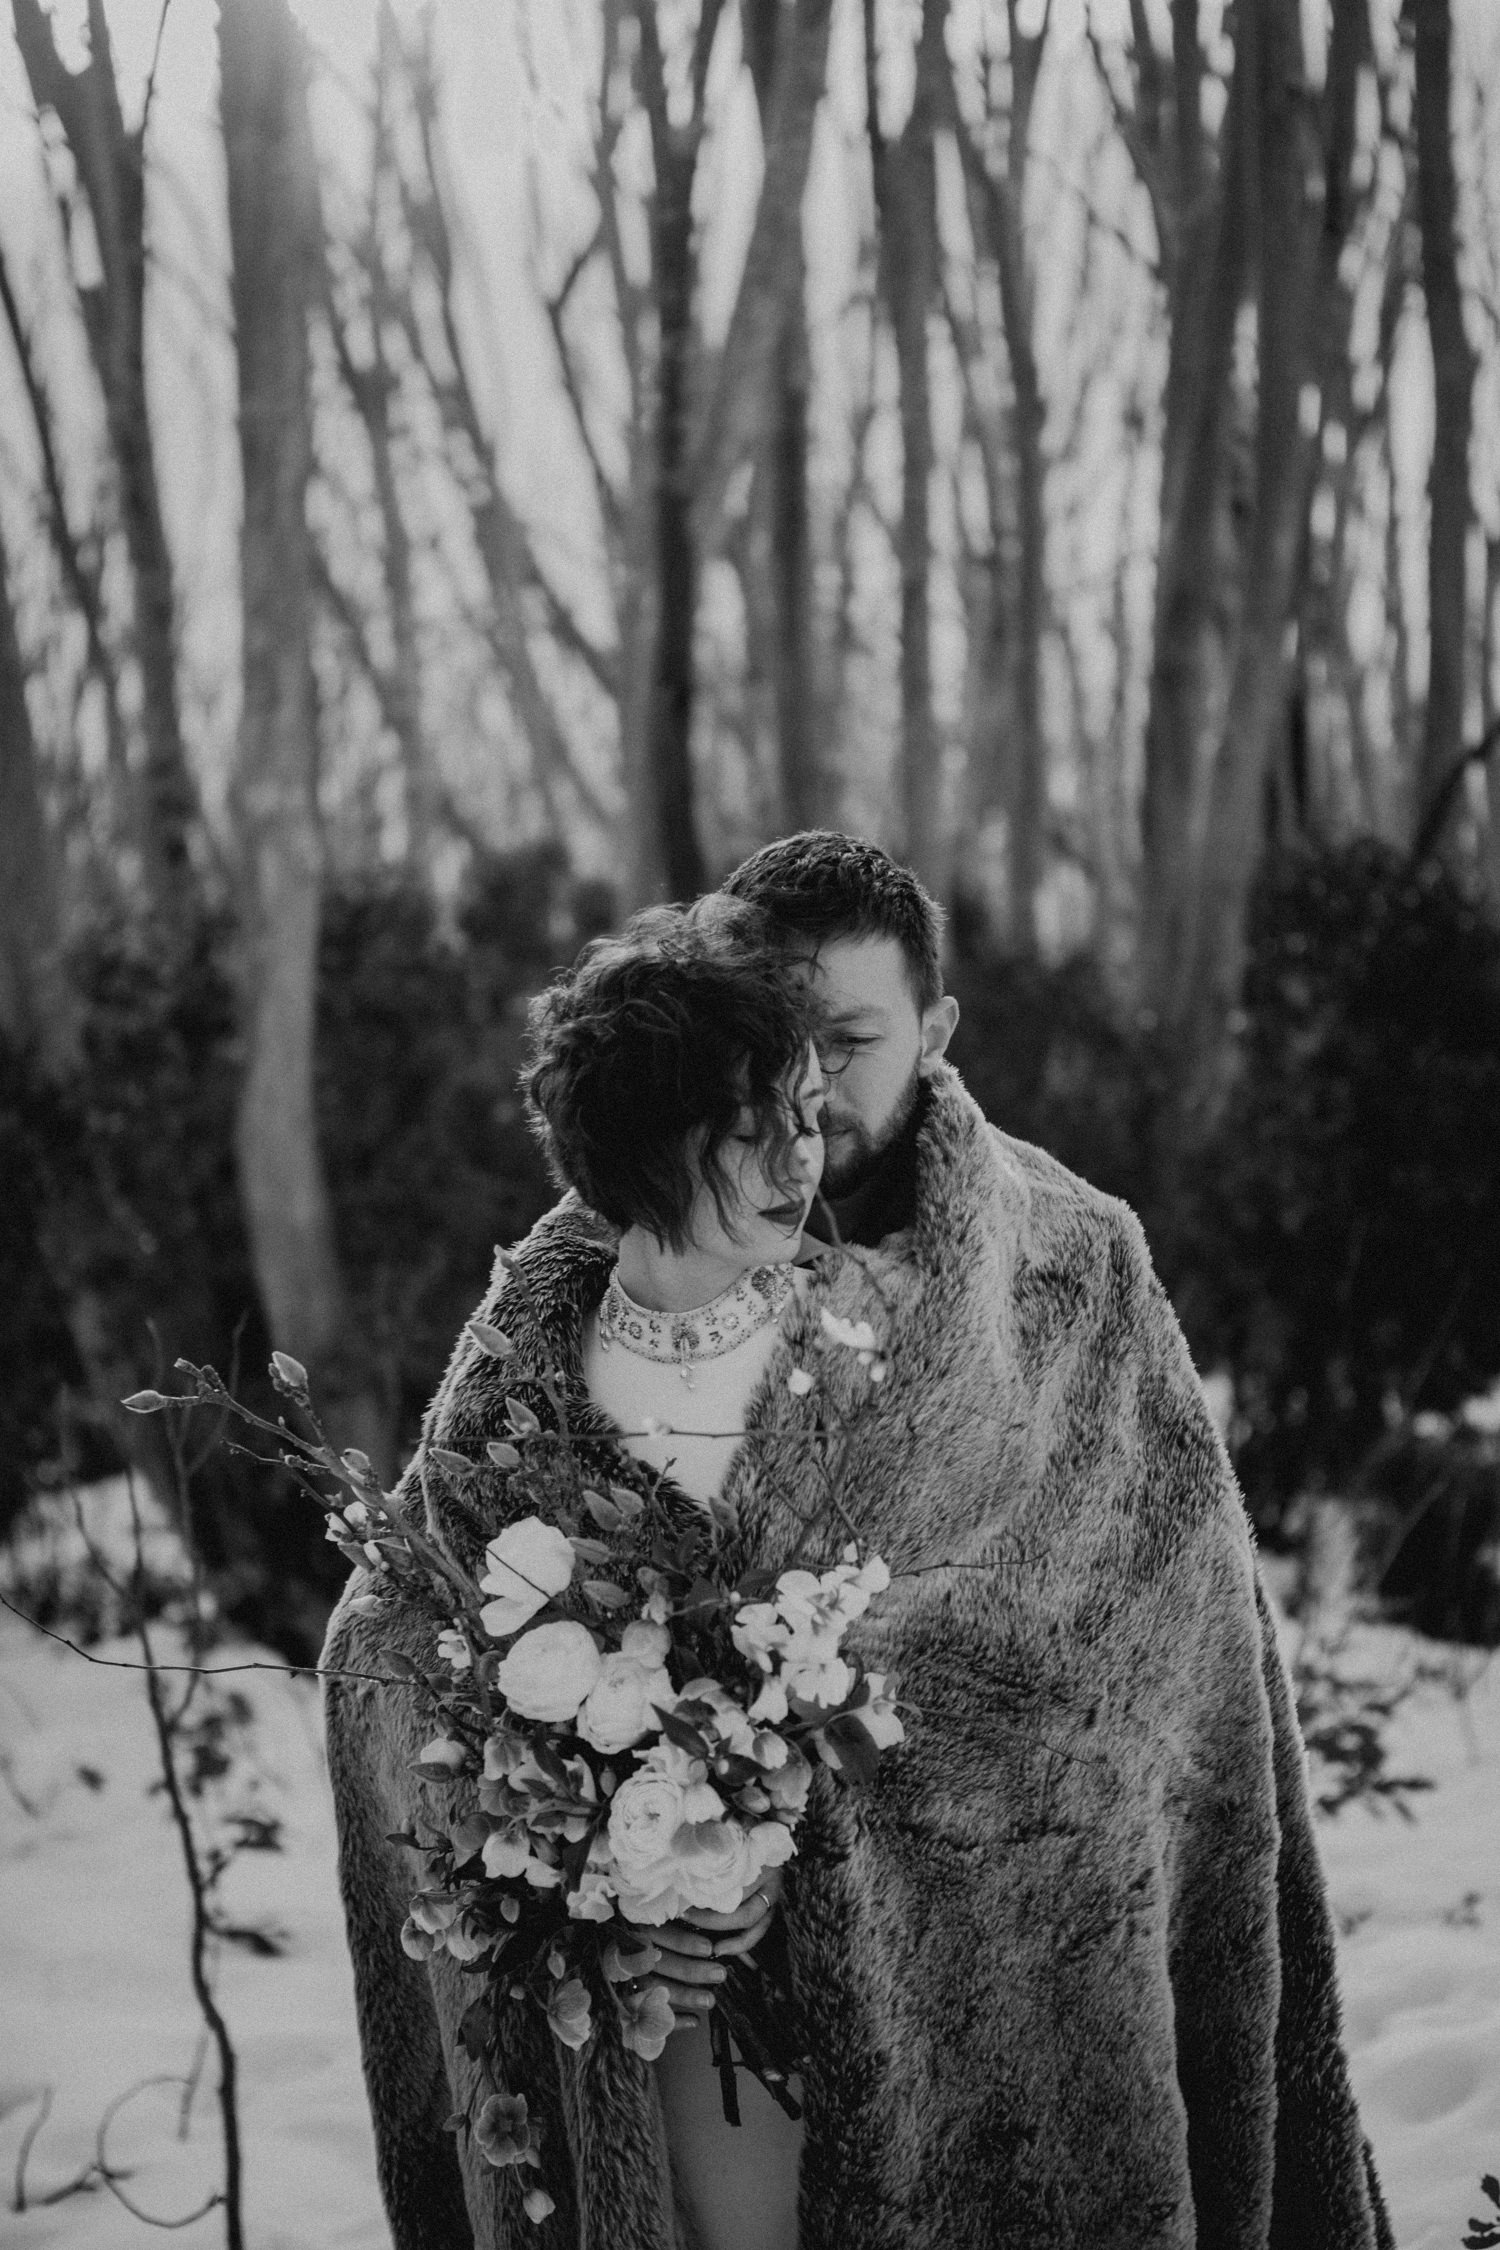 Winter_Elopement_Amie_Nick_Anna_Taylor_164-185A2871.jpg